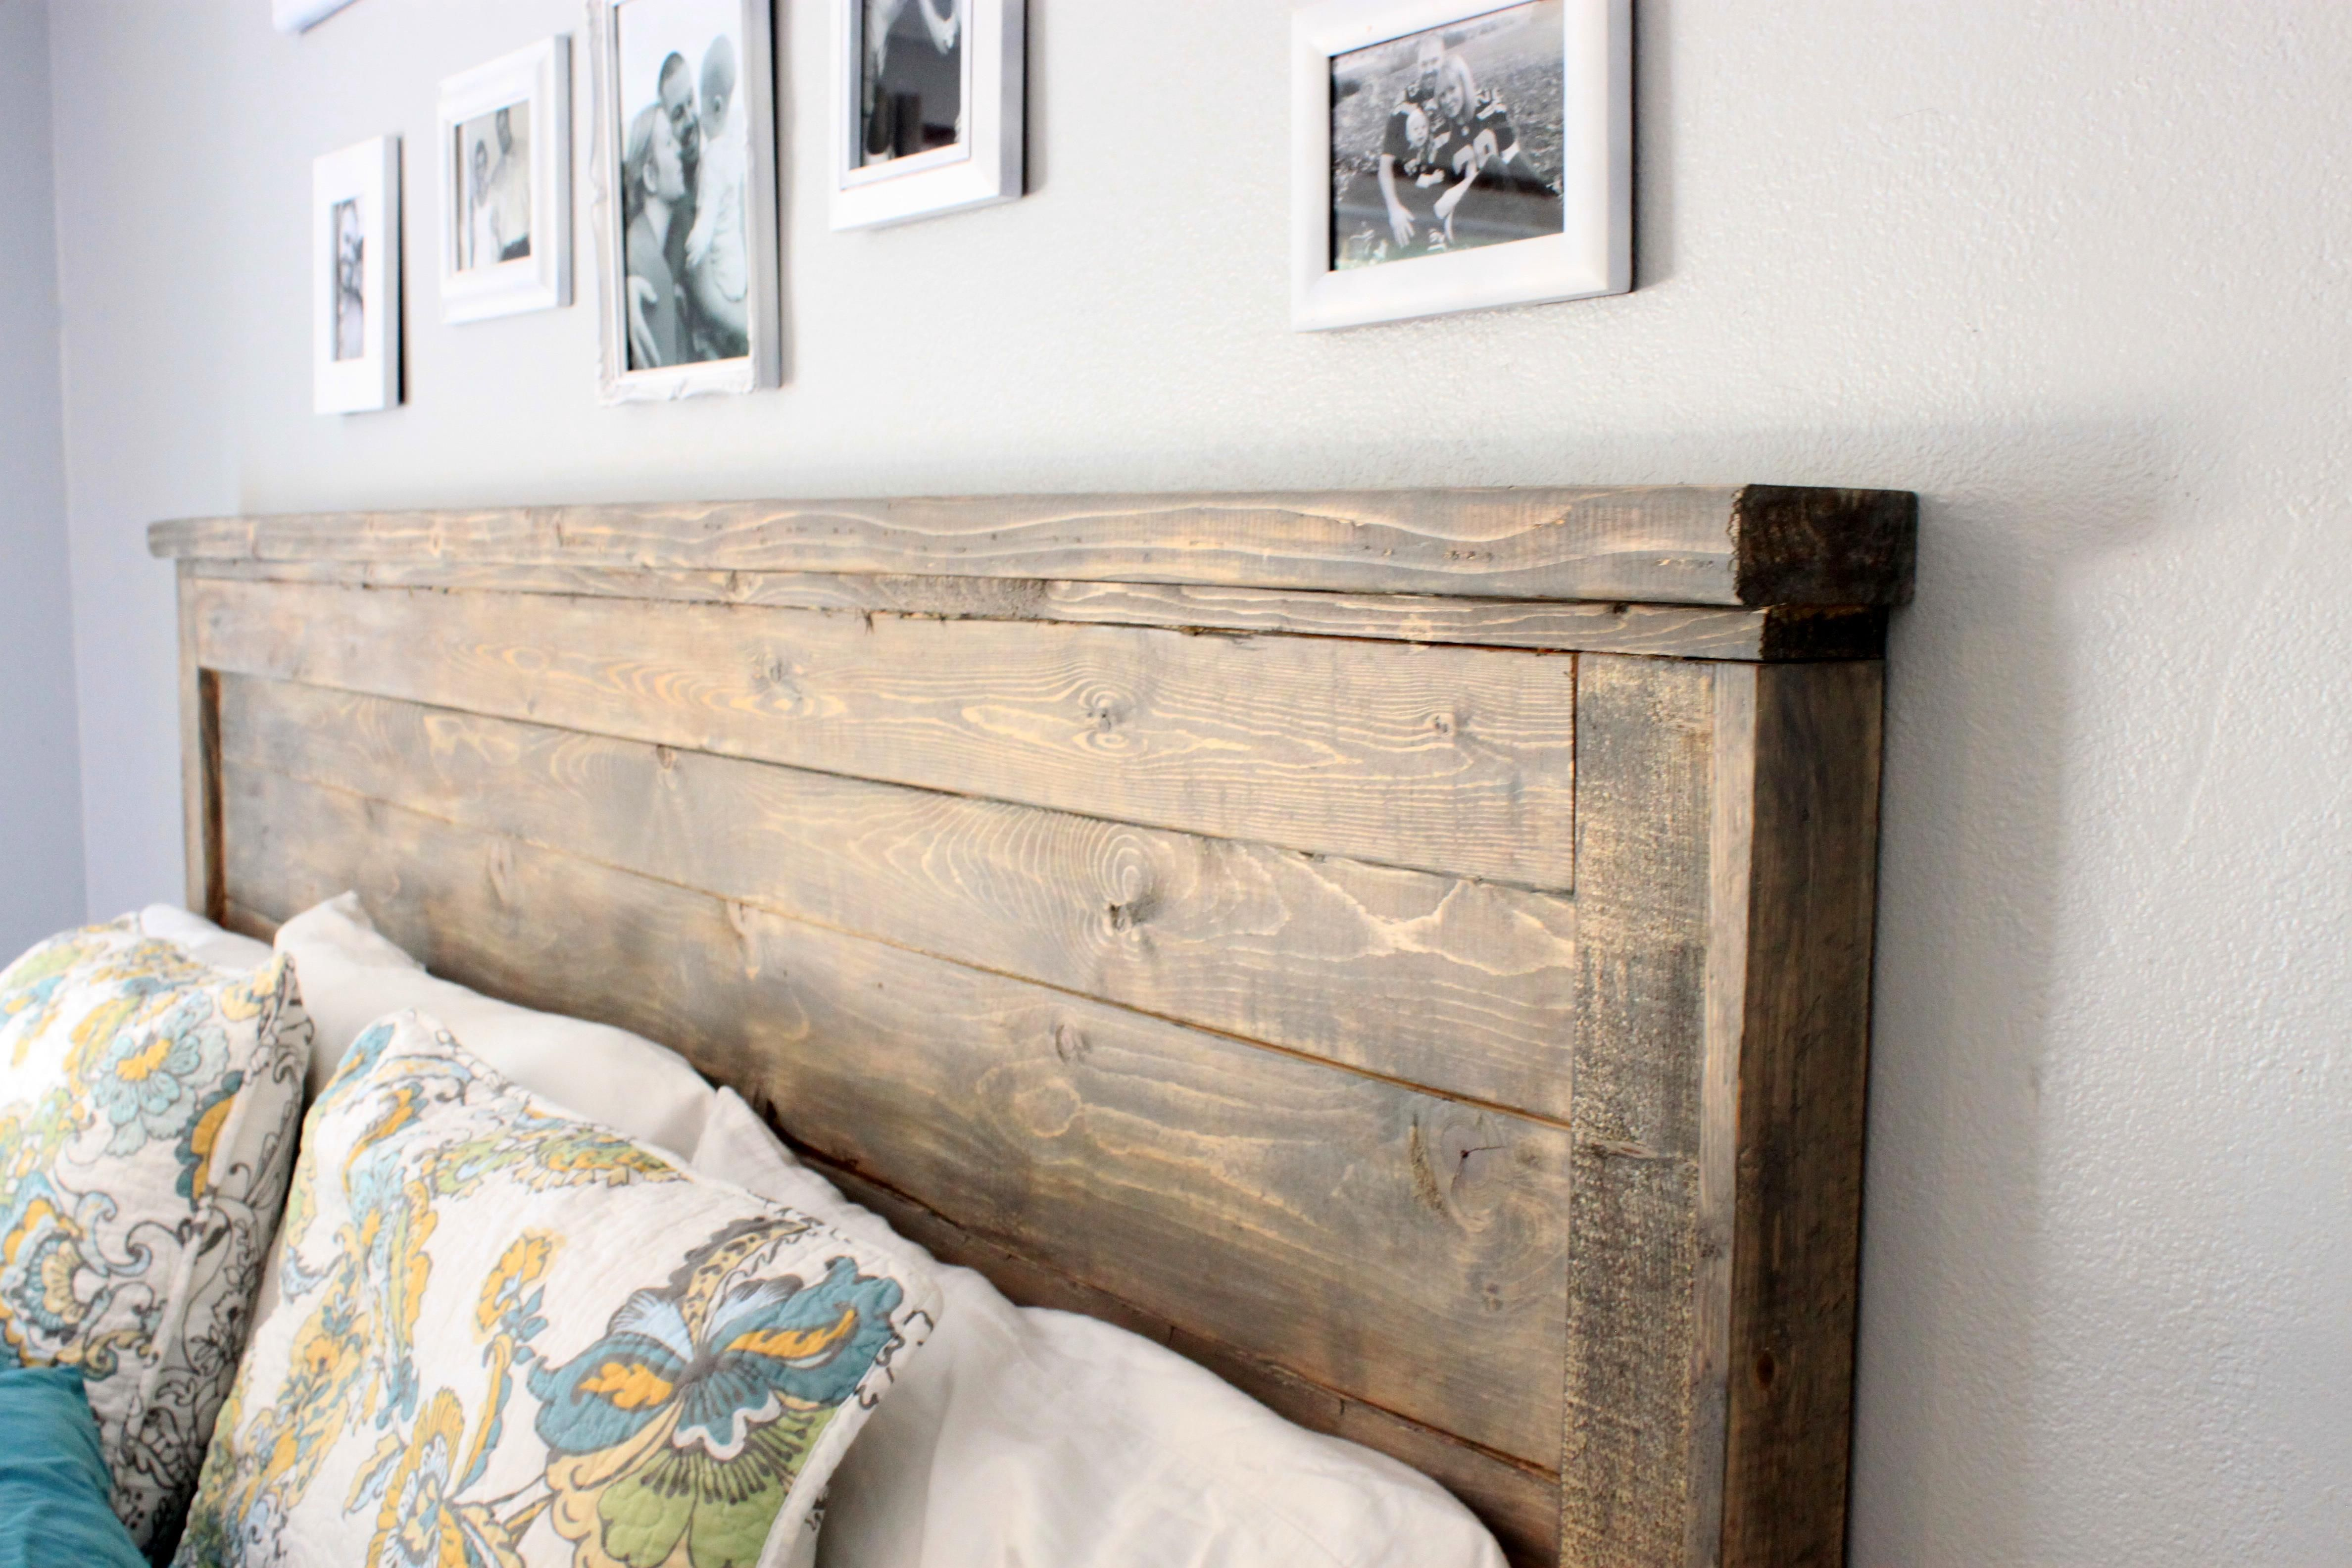 Distressed Wood Headboard Standard King Size To Make